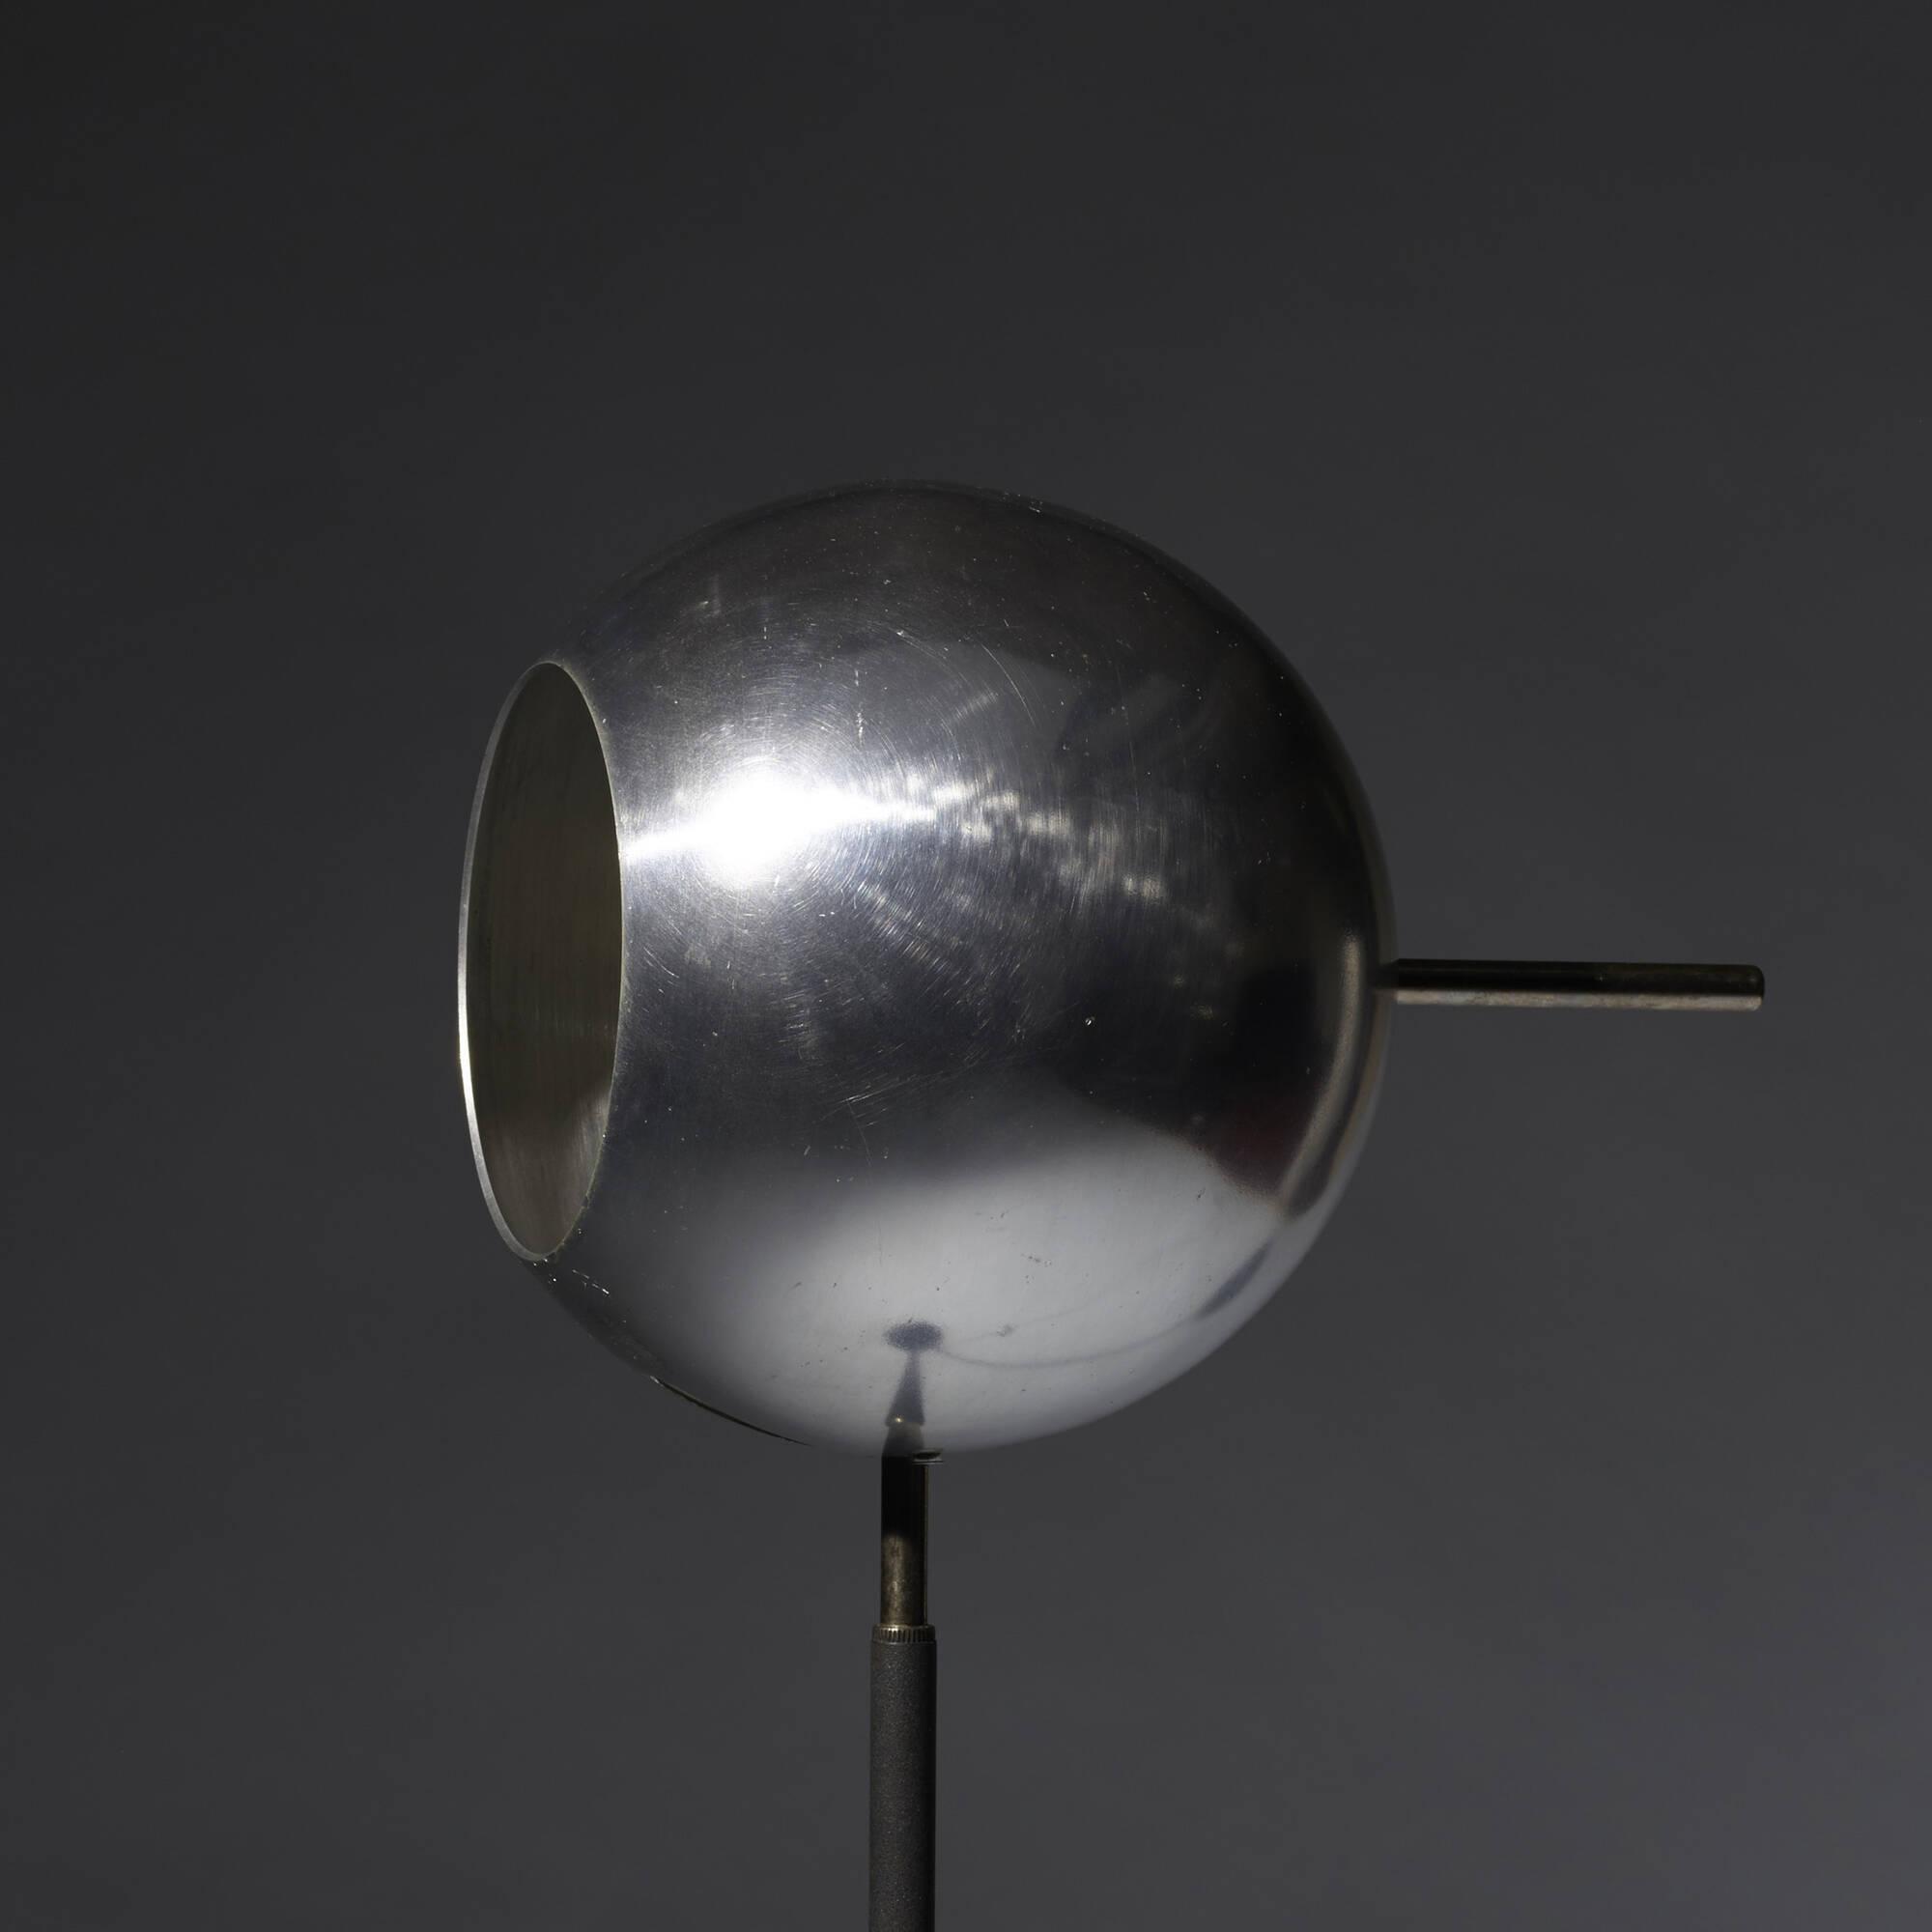 286: Gino Sarfatti / floor lamp, model 1082 N (3 of 3)